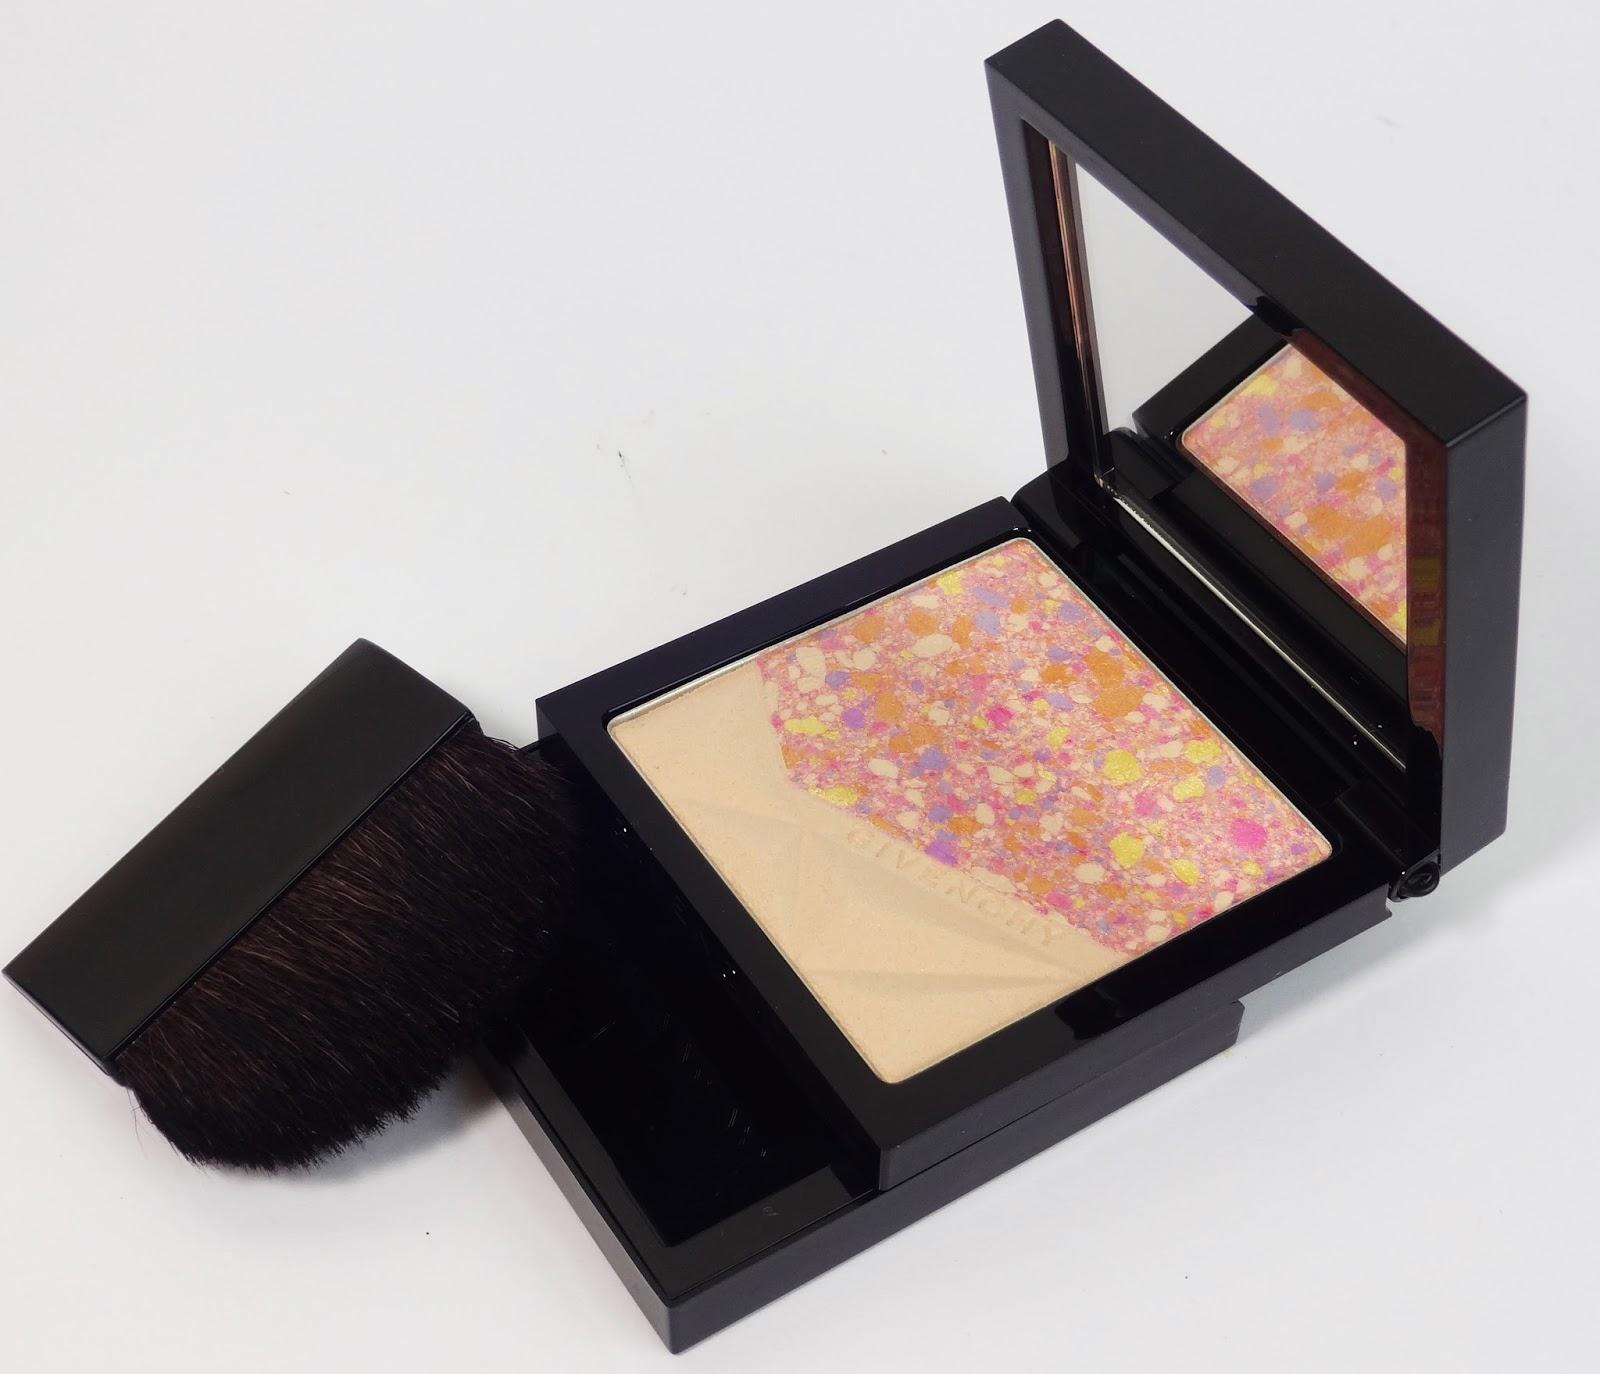 Givenchy - Le Prisme Visage Color Confetti (Spring 2015) Pretty Clover Beautyblog Gesichtspuder